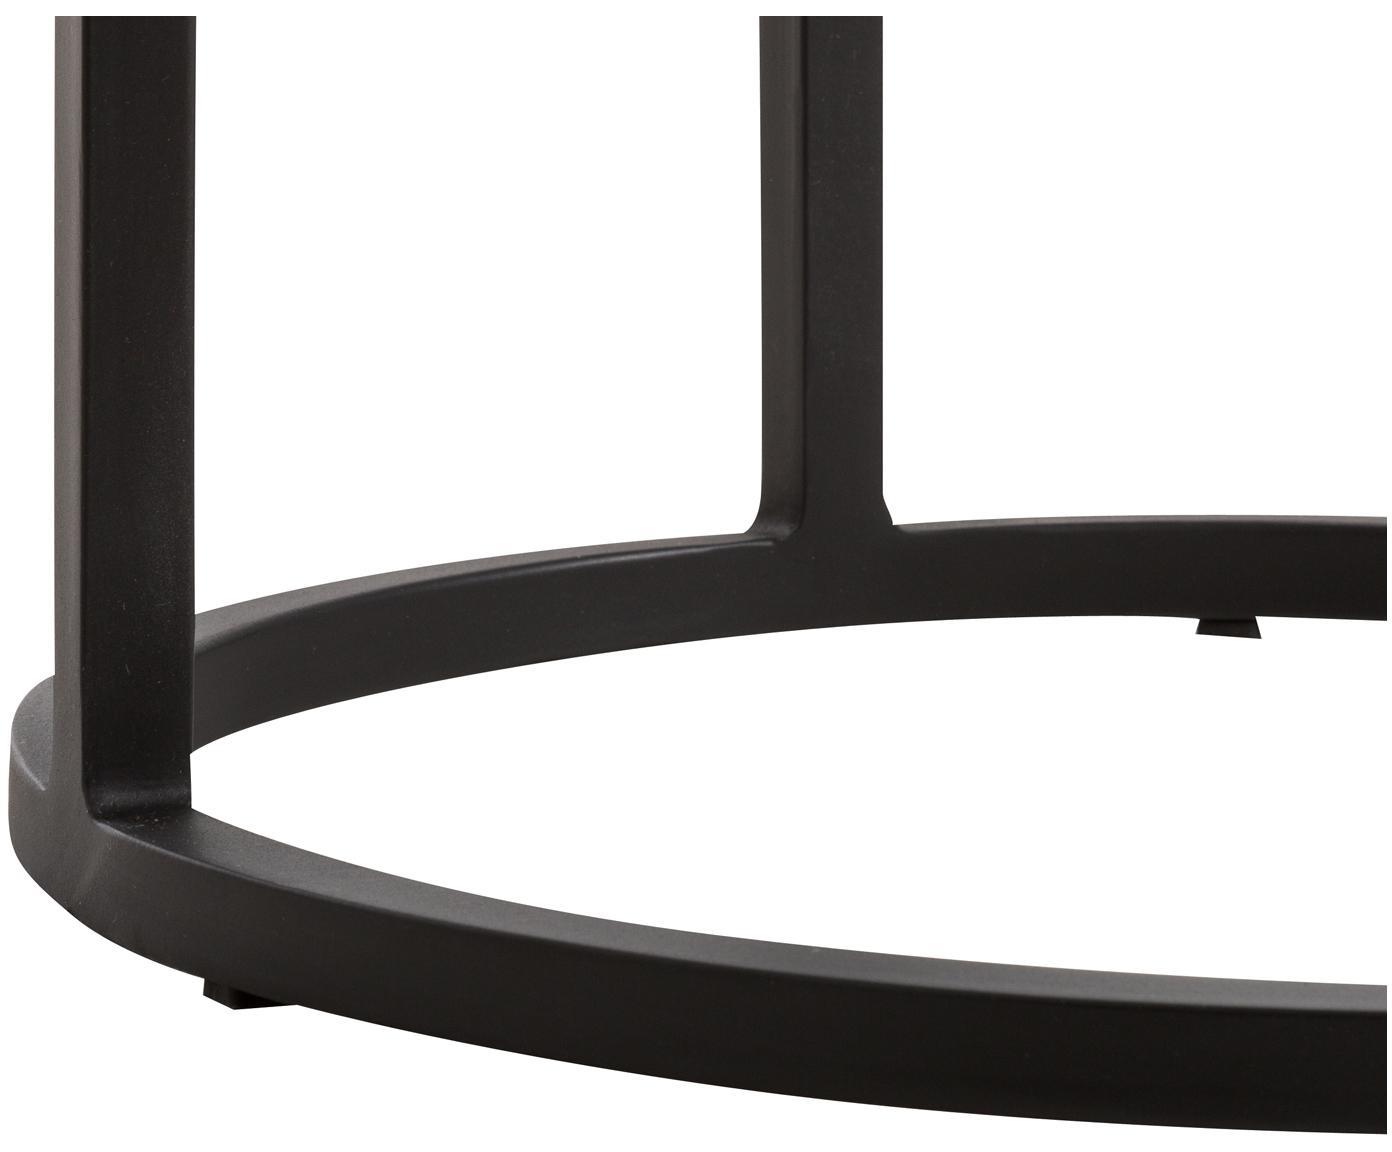 Runder Beistelltisch Circle aus Metall, Tischplatte: Metall, beschichtet, Gestell: Metall, pulverbeschichtet, Tischplatte: Schwarz mit Antik-Finish Gestell: Schwarz, matt, Ø 36 x H 66 cm